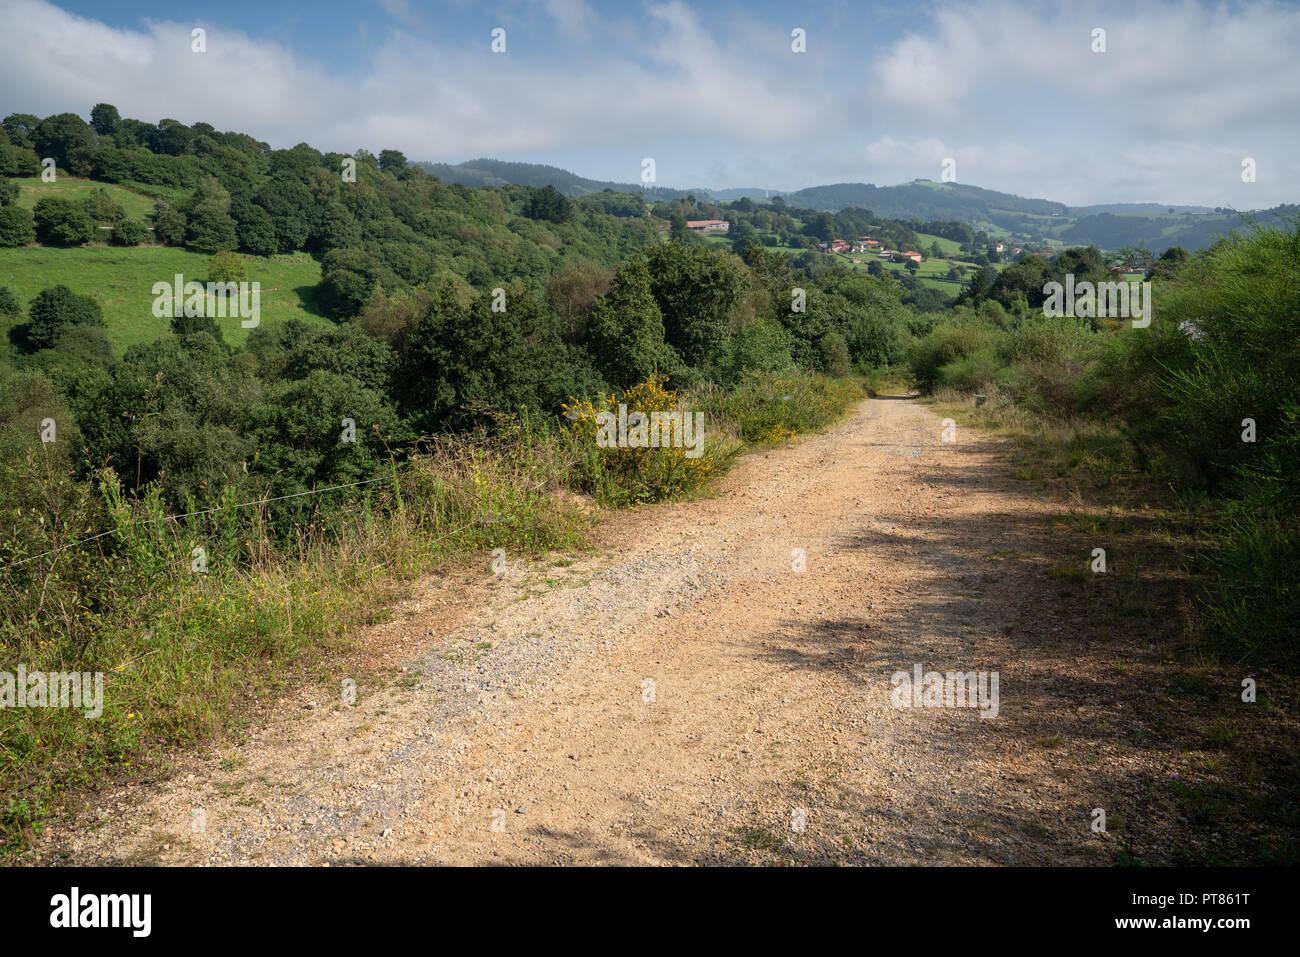 Camino de Santiago trail between Salas and Tineo, Asturias, Spain - Stock Image